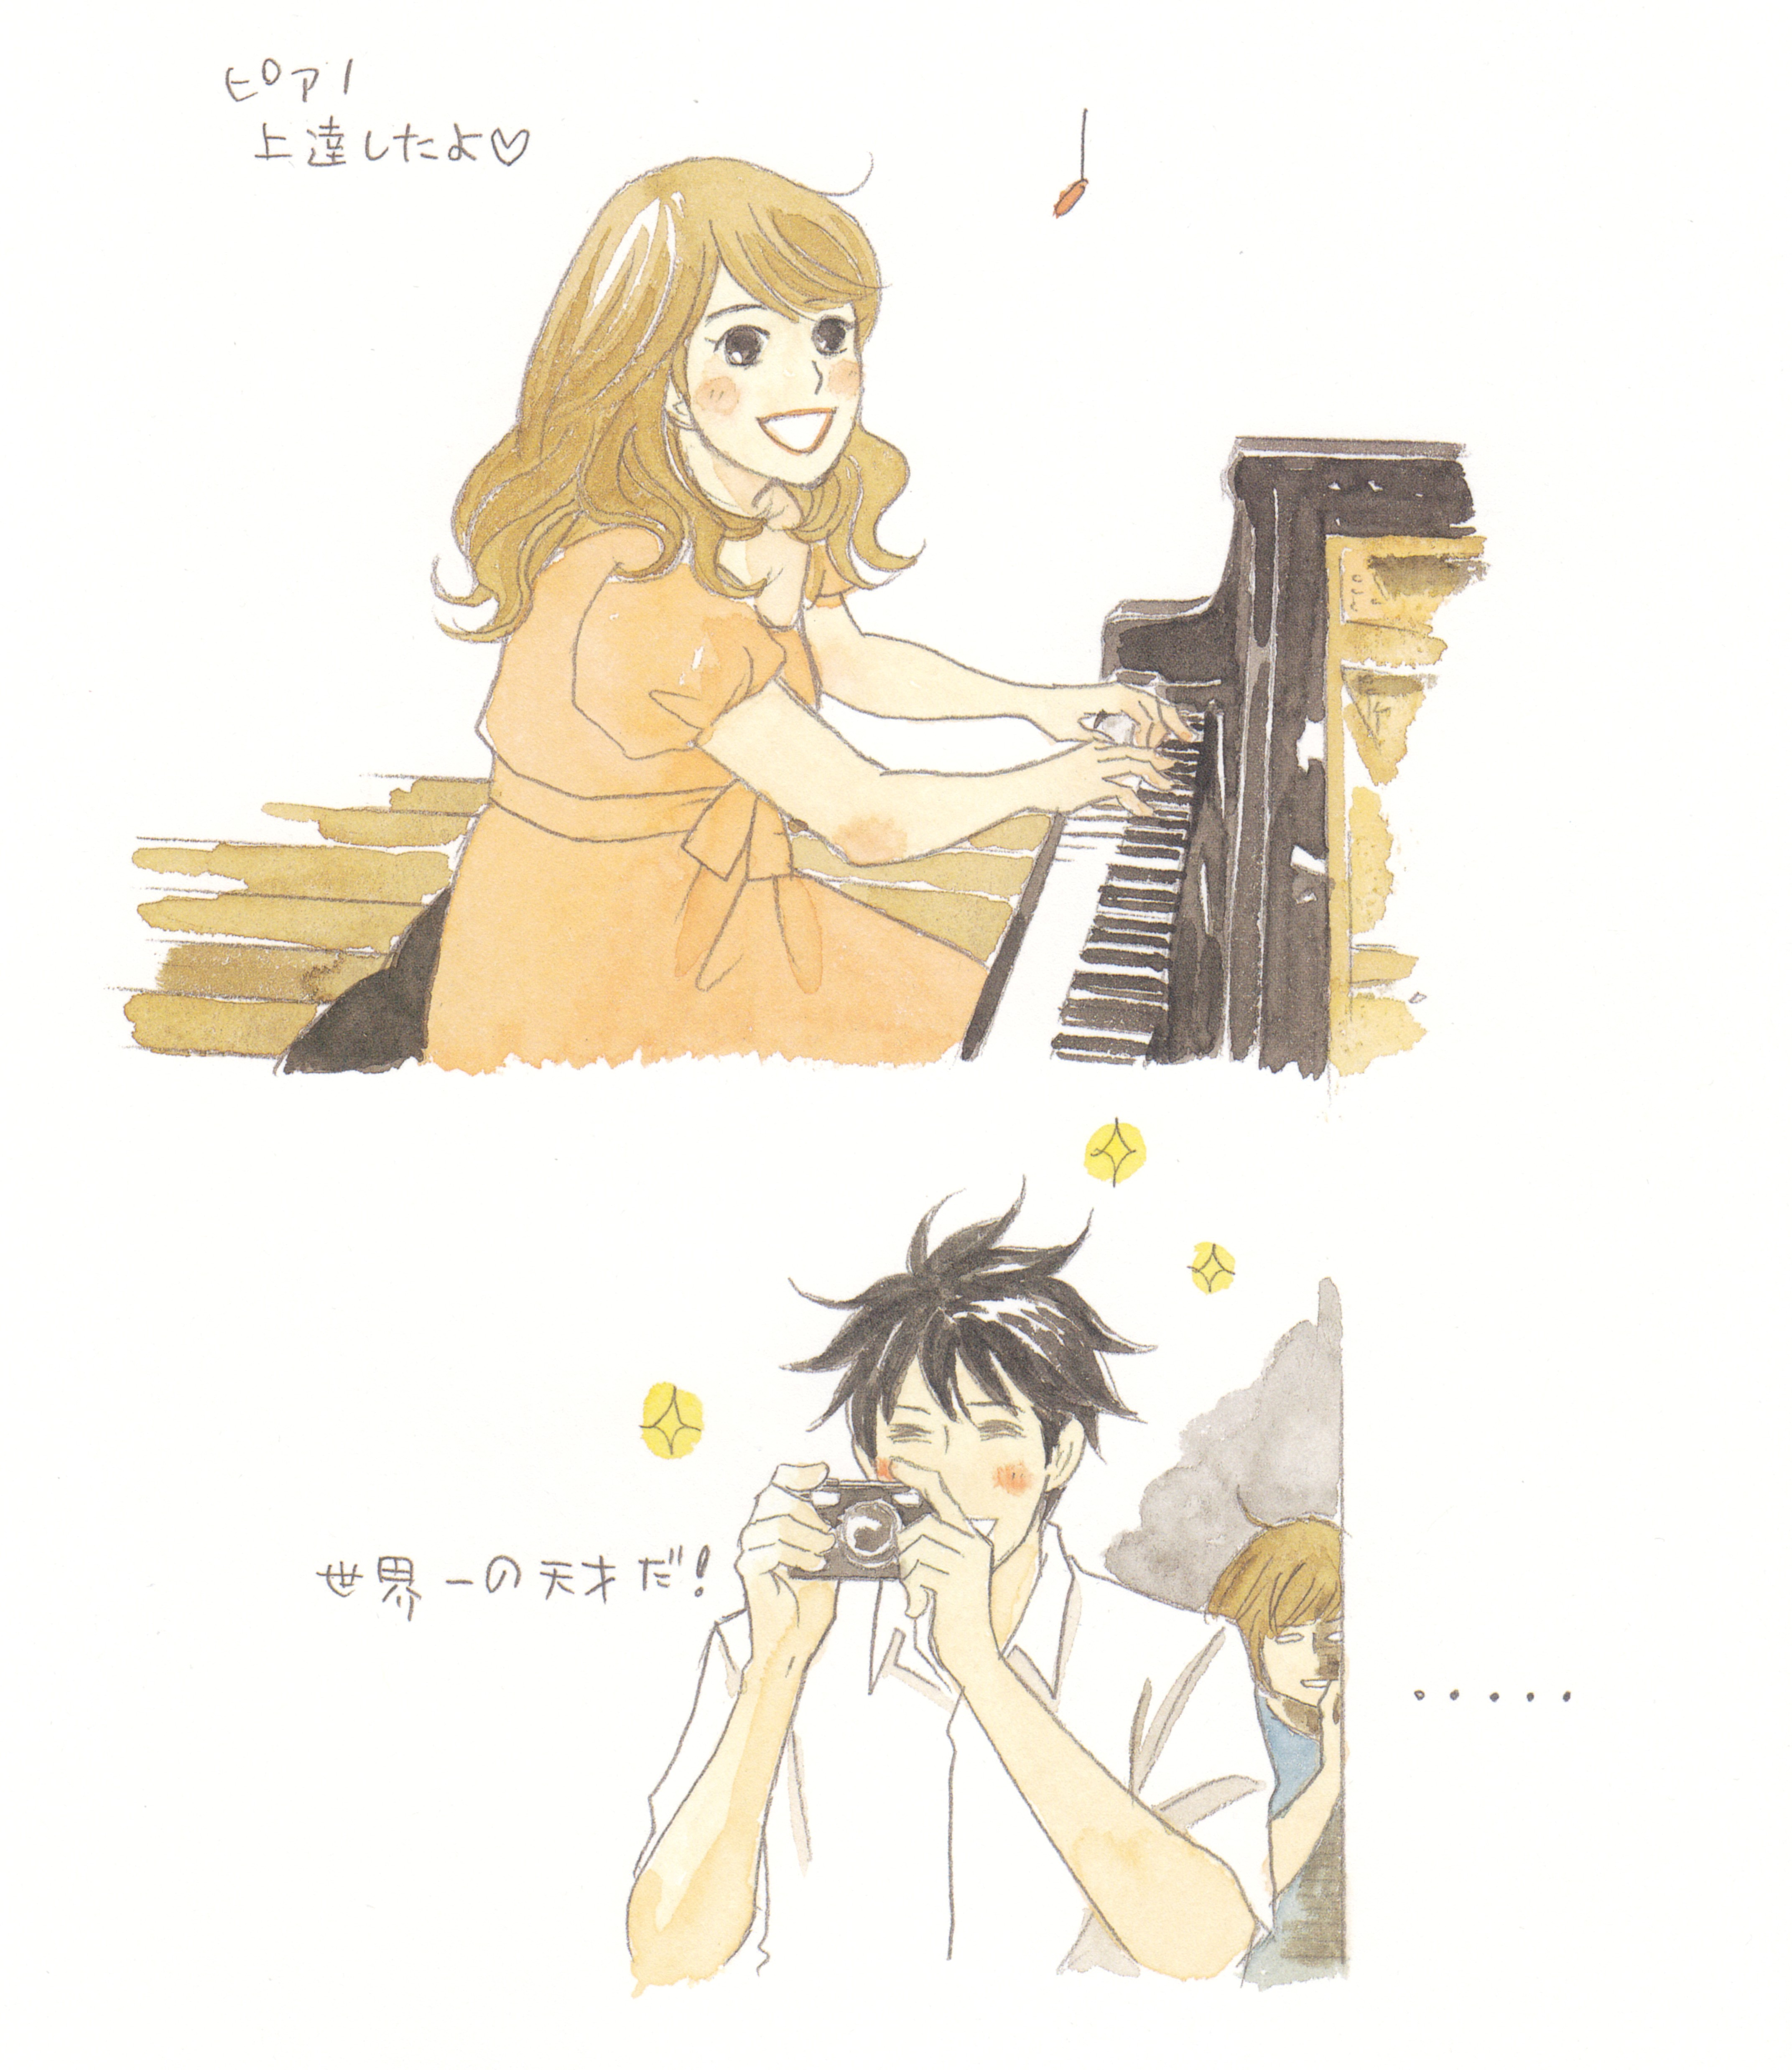 Nodame Cantabile Ninomiya Tomoko: Nodame Cantabile: Nodame Illustrations P.35